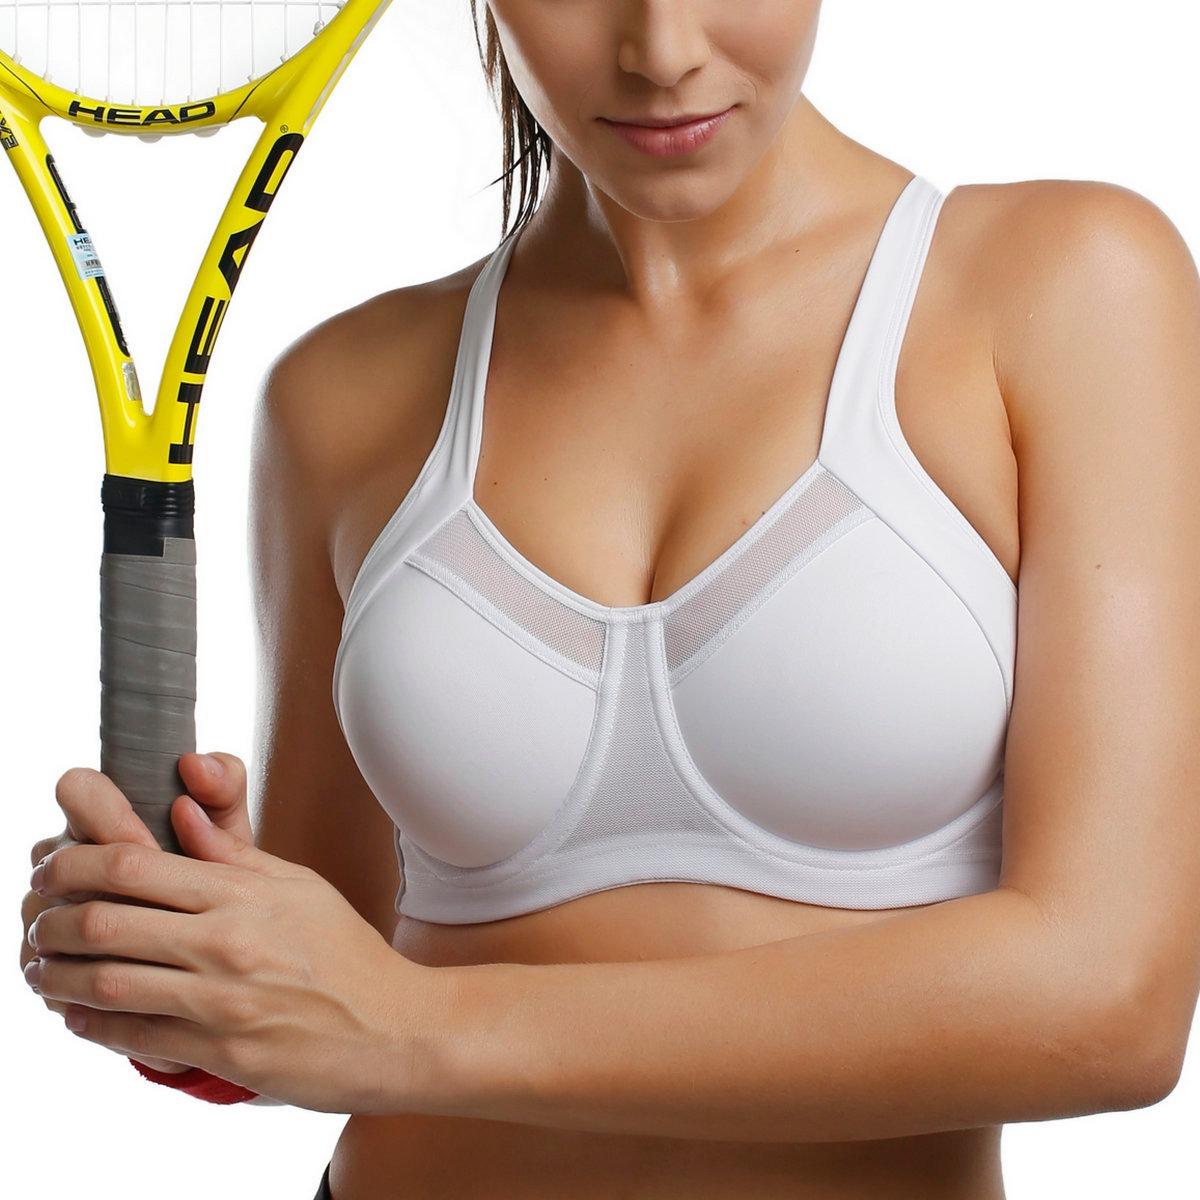 Women-039-s-High-Impact-Workout-Running-Powerback-Support-Underwire-Sports-Bra